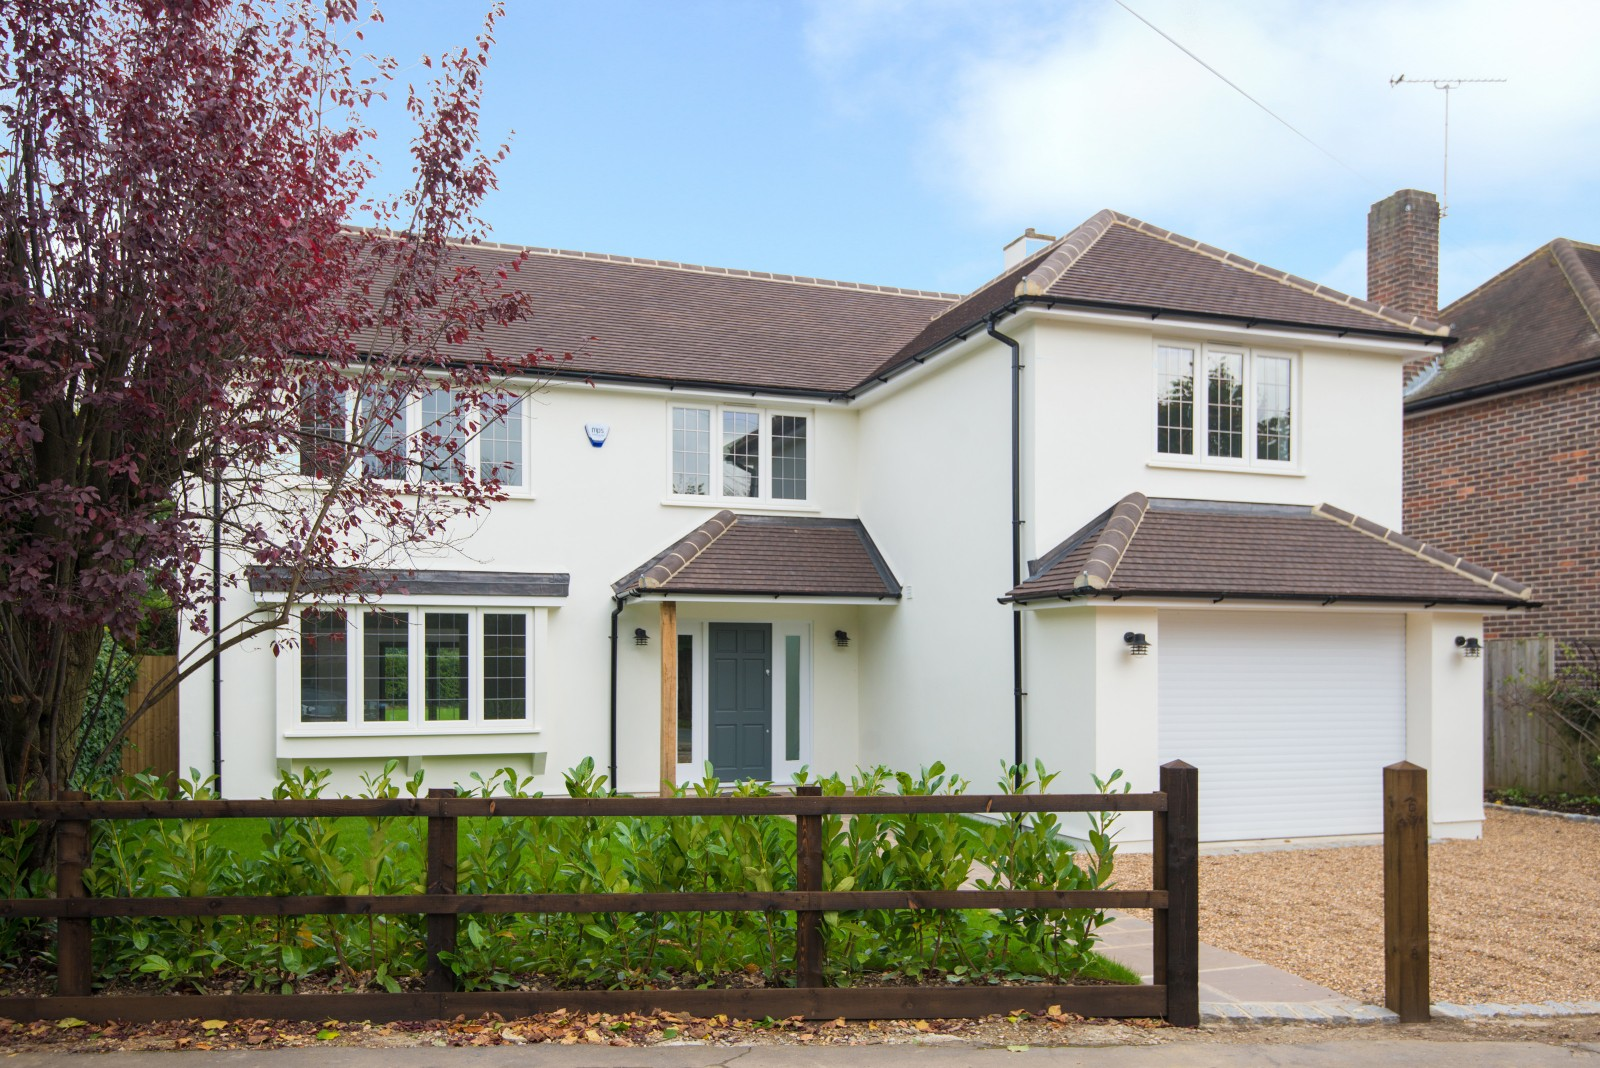 Villa per Affitto alle ore Orchehill Avenue, Gerrards Cross, Buckinghamshire, SL9 Gerrards Cross, Inghilterra